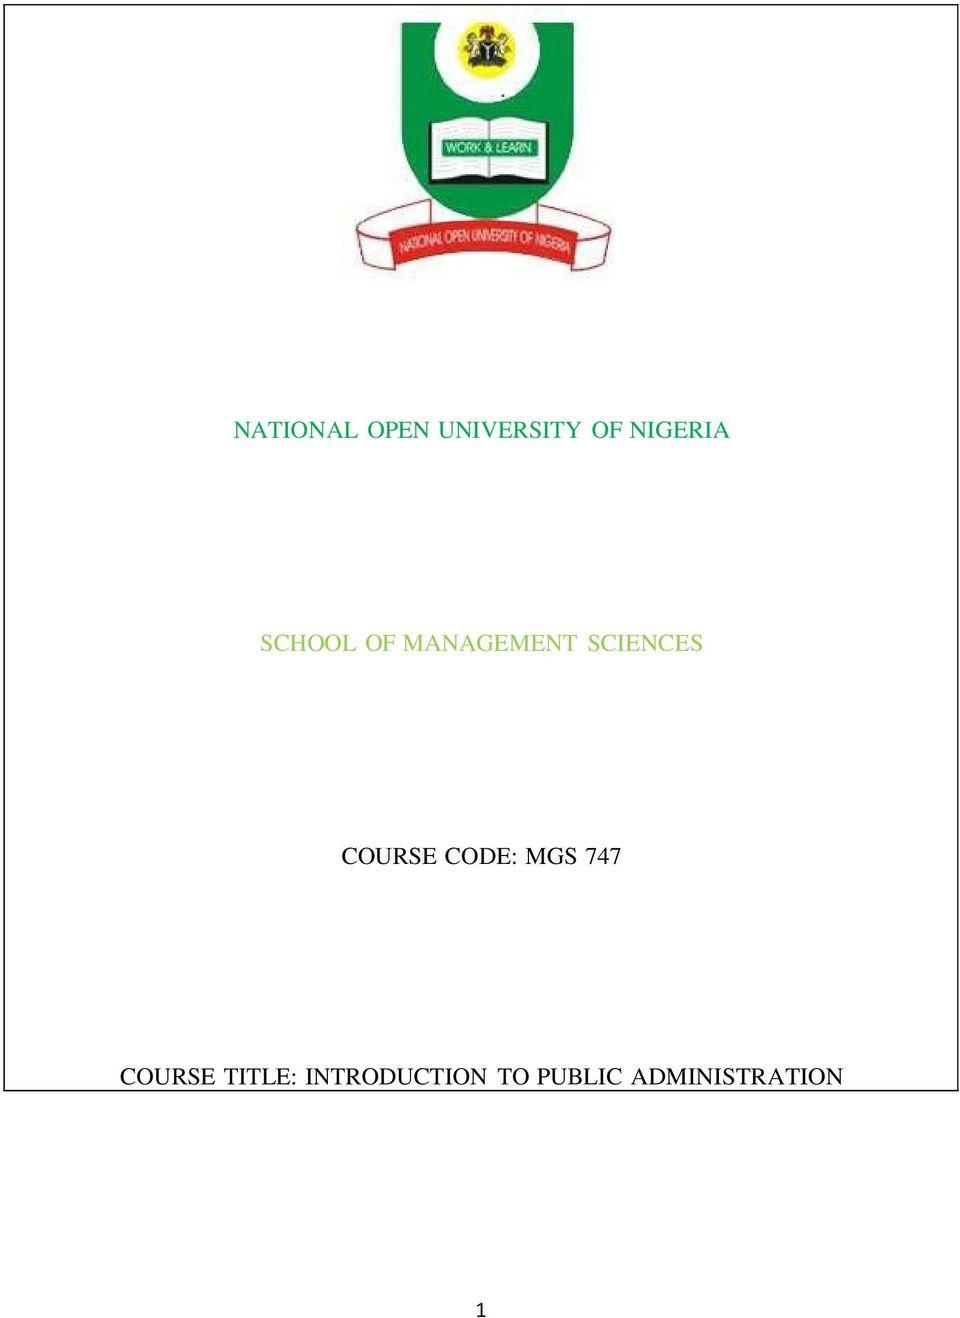 NATIONAL OPEN UNIVERSITY OF NIGERIA SCHOOL OF MANAGEMENT